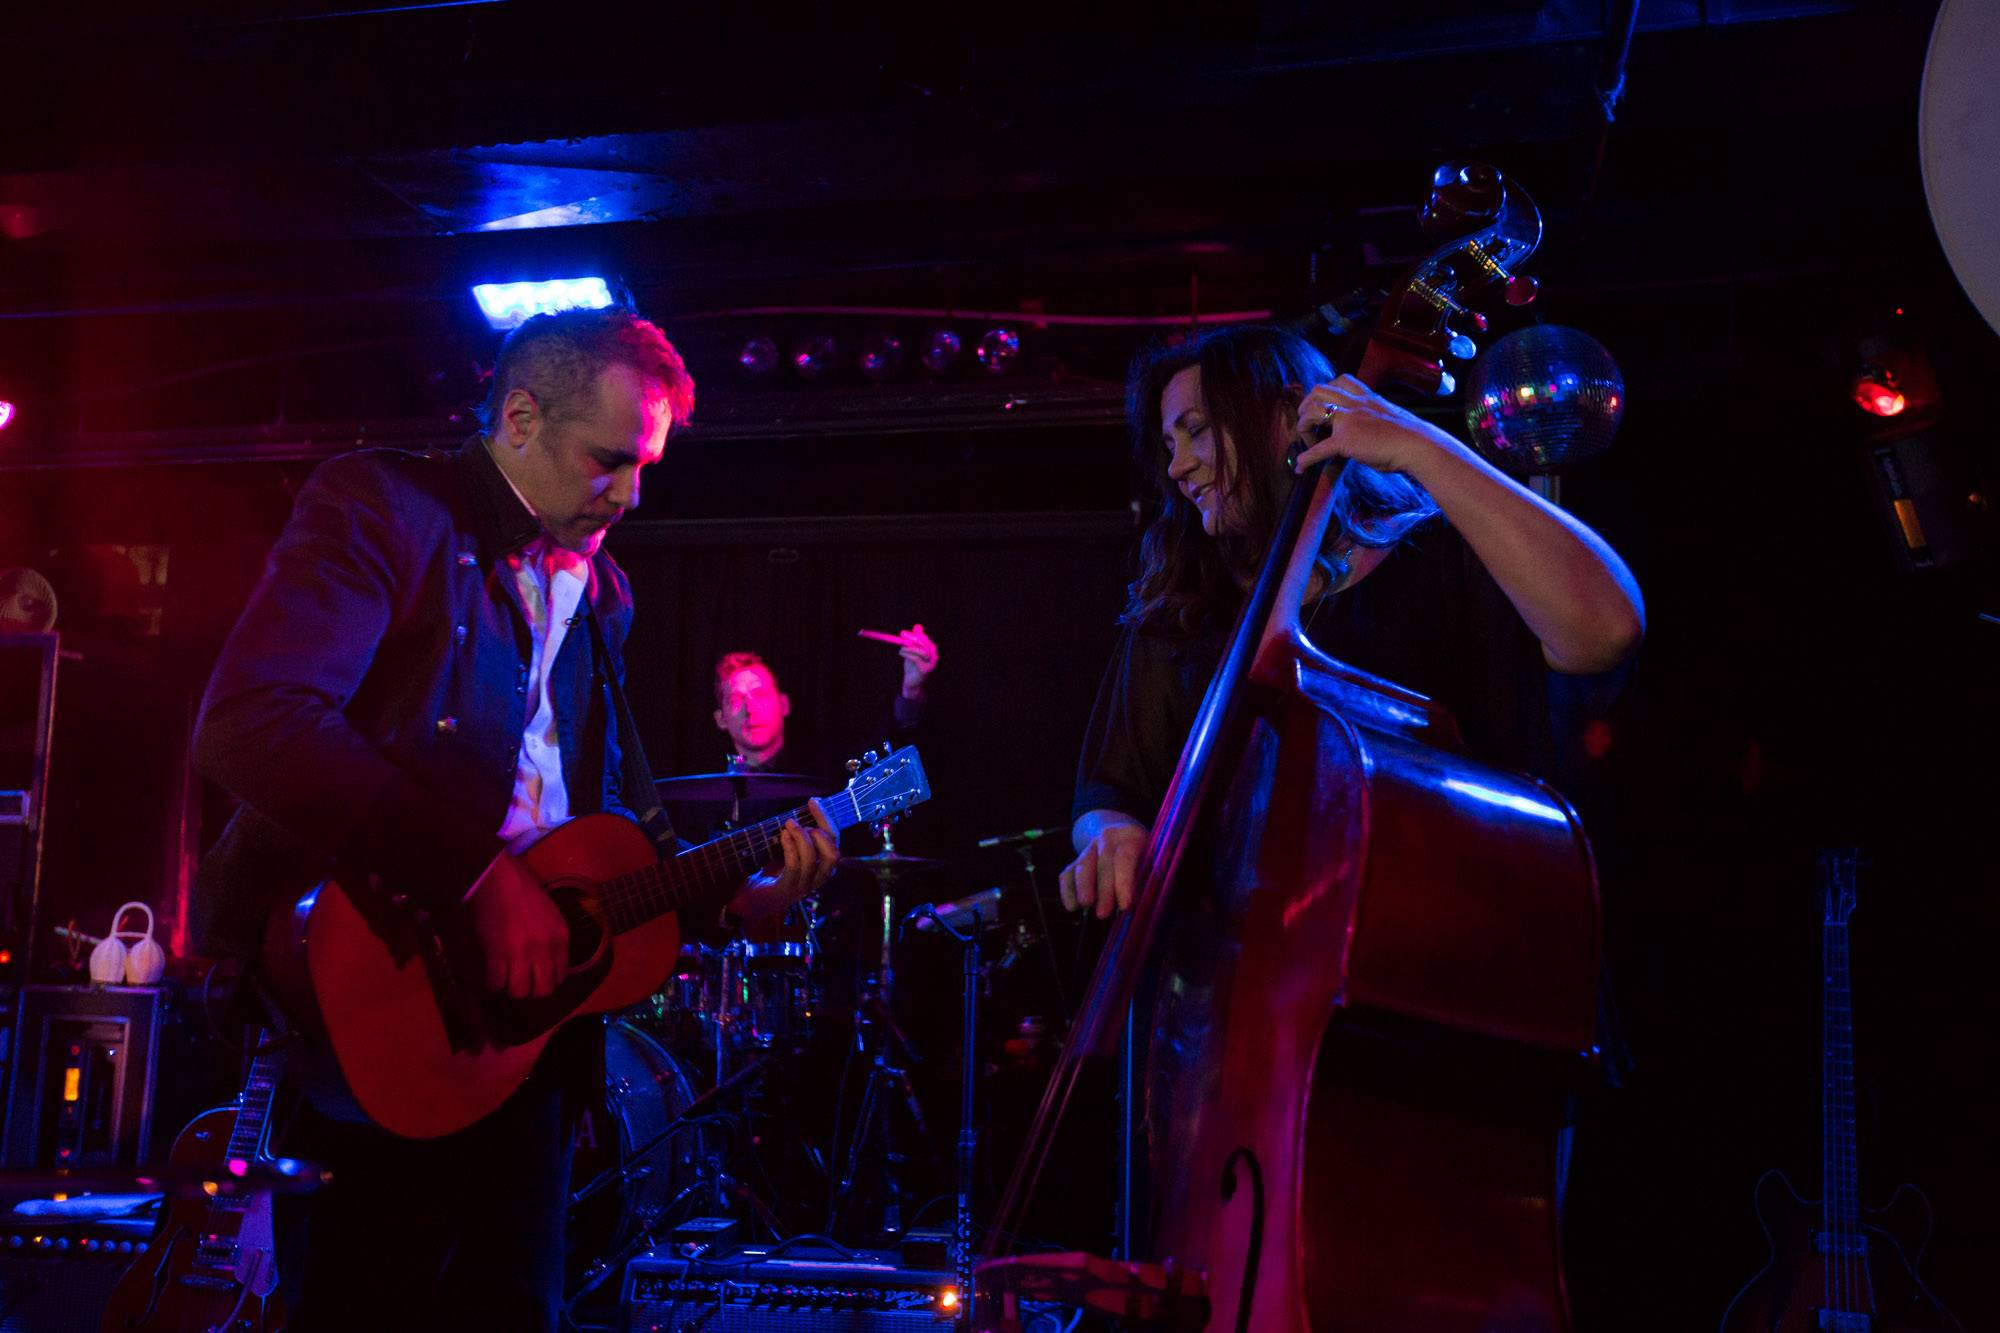 Devotchka at the Biltmore Cabaret, Vancouver, Jan. 8 2016. Kirk Chantraine photo.